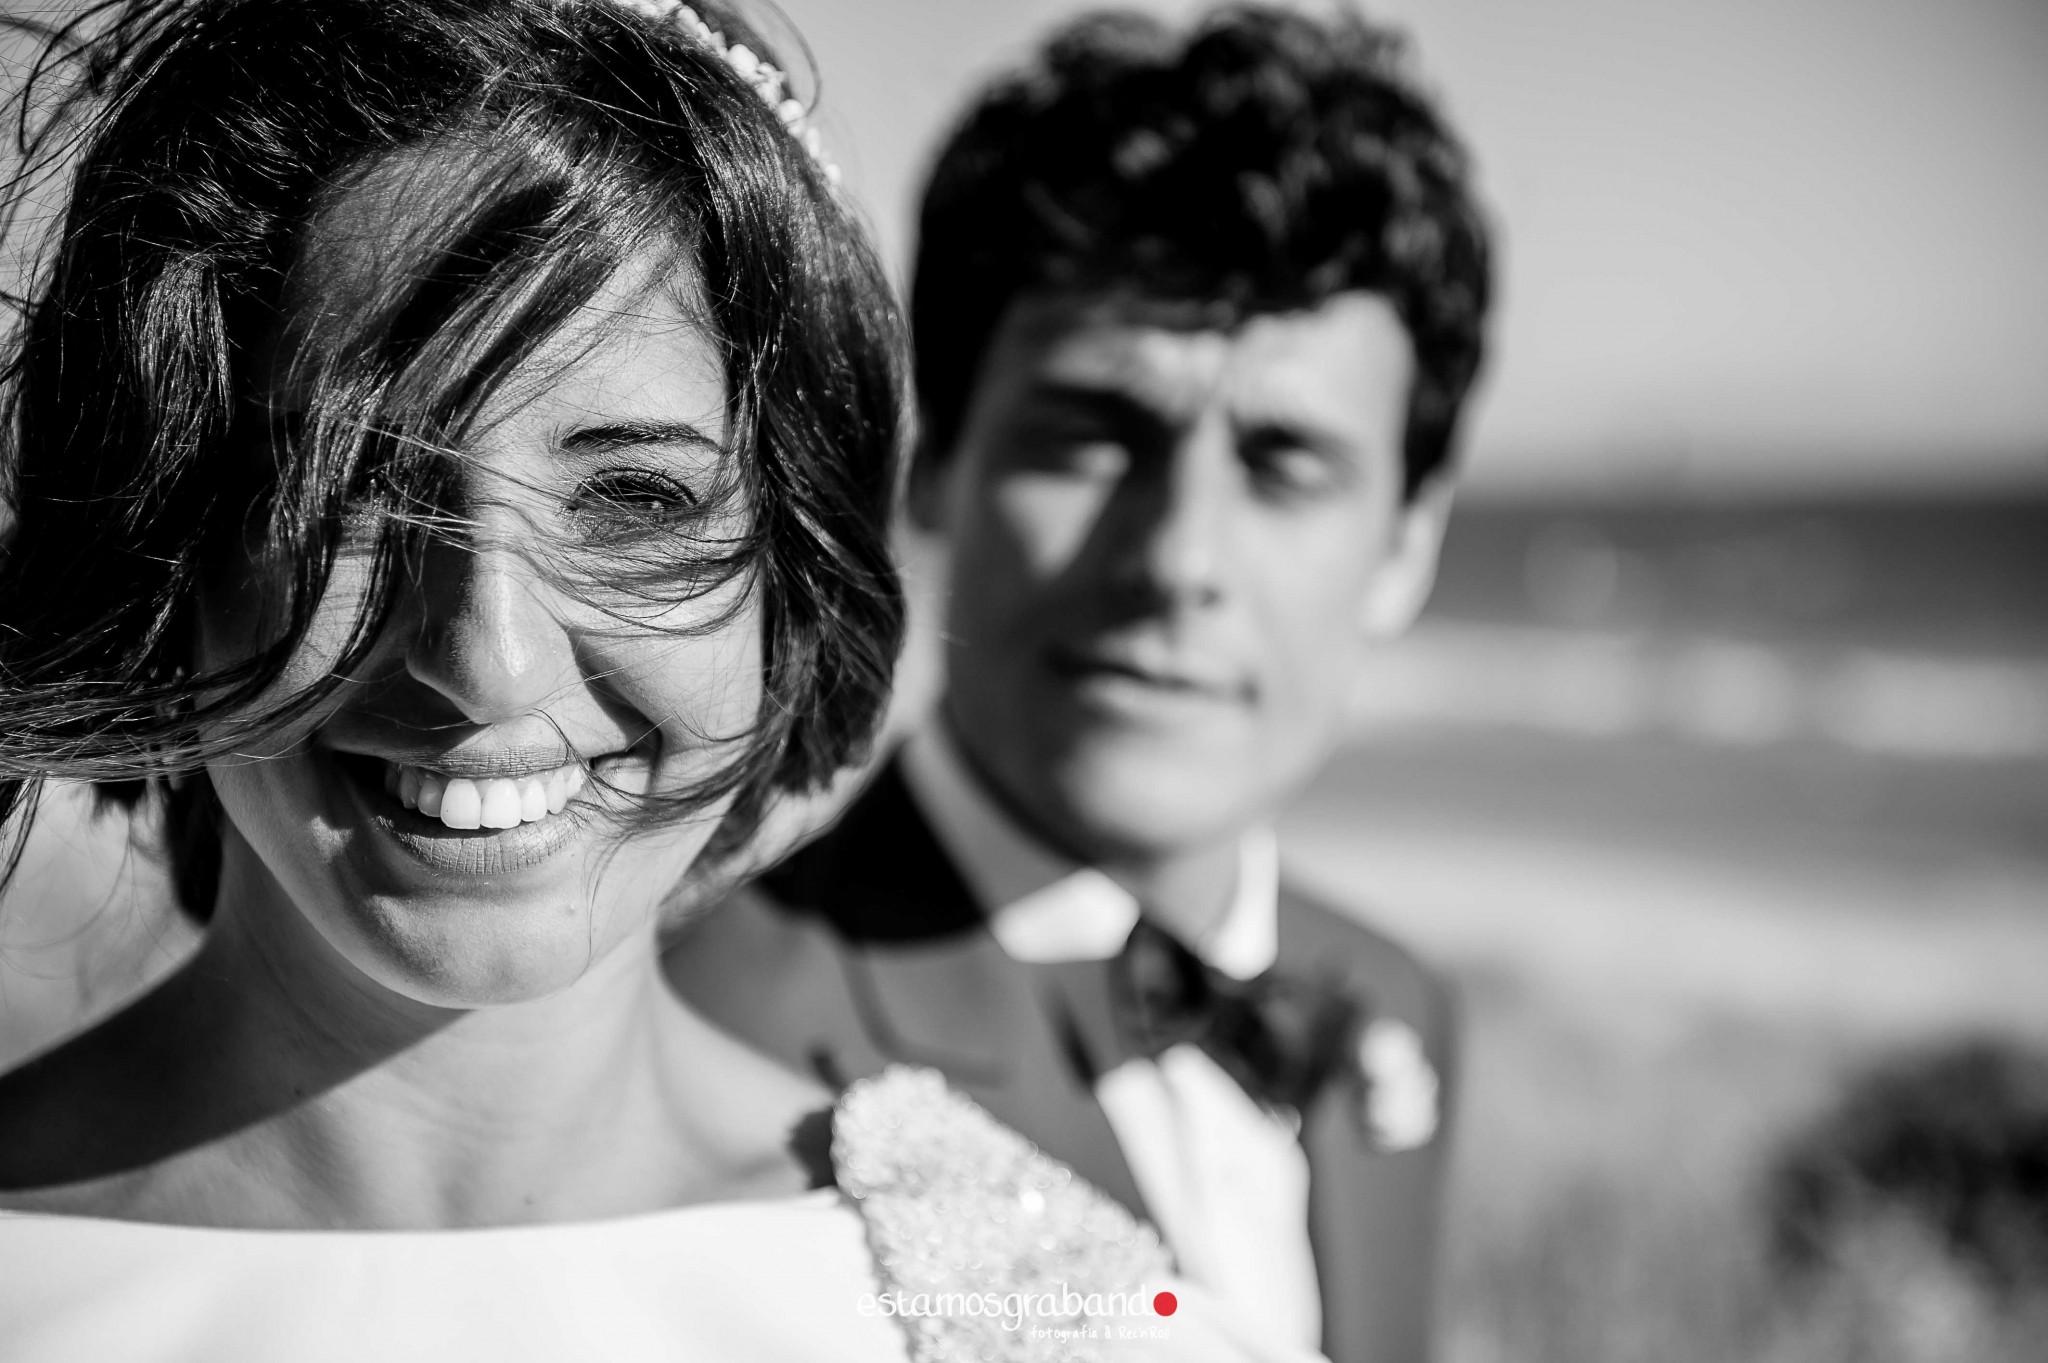 jesus-y-lucia_fotografia-boda_boda-tarifa_tarifa-fotografia-bodas_reportaje-boda_reportaje-boda-tarifa_fotos-boda_fotos-tarifa-19 Jesús y Lucía - video boda cadiz